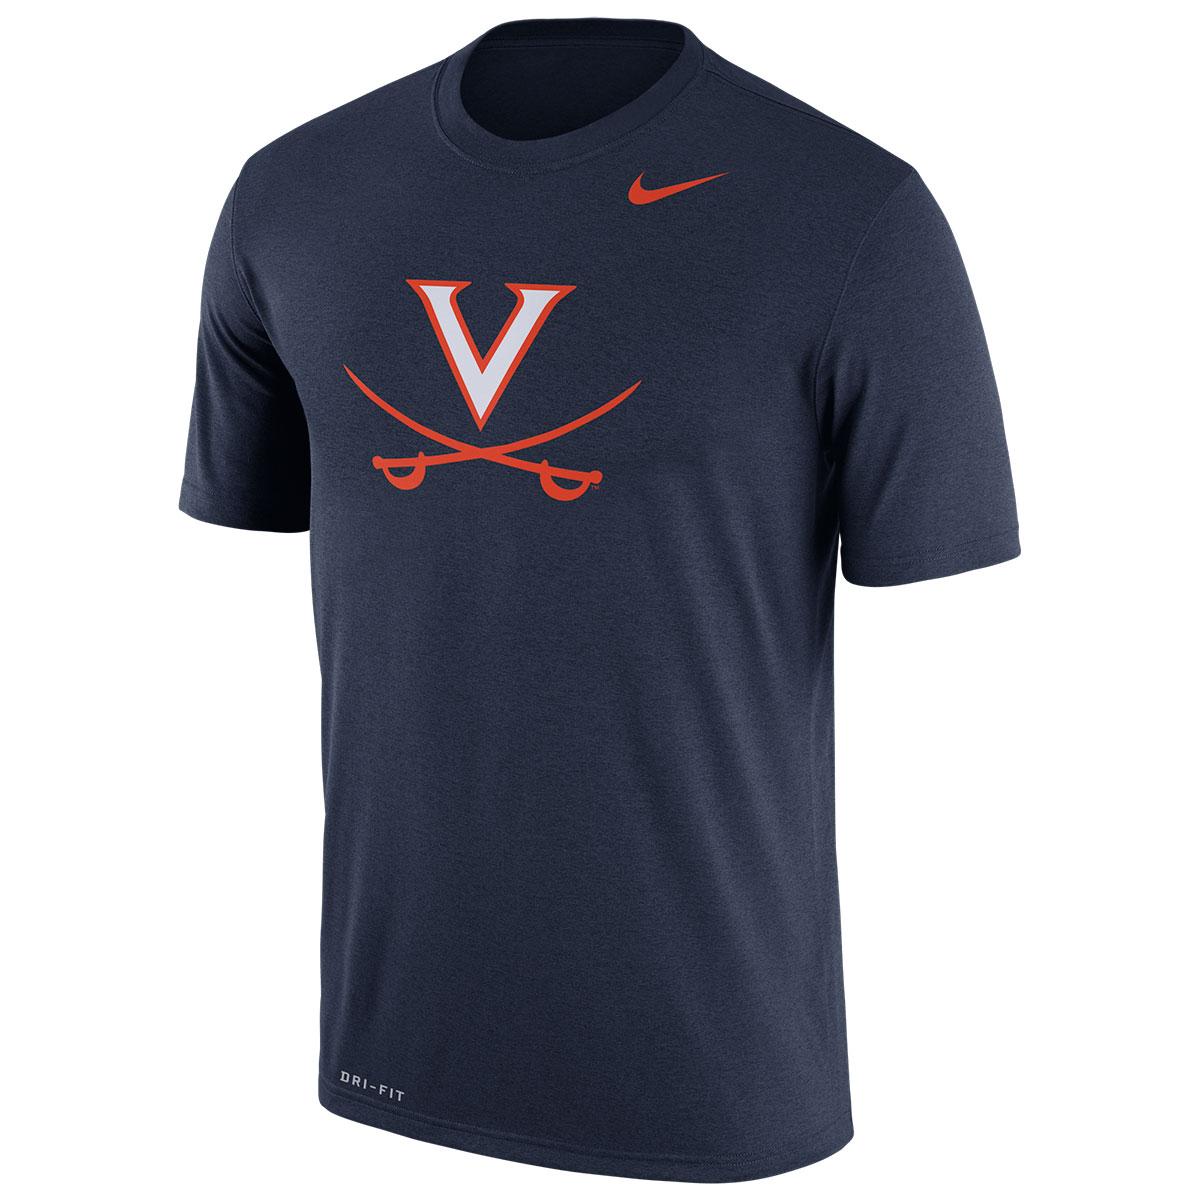 University of Virginia Nike Dri-FIT T-Shirt